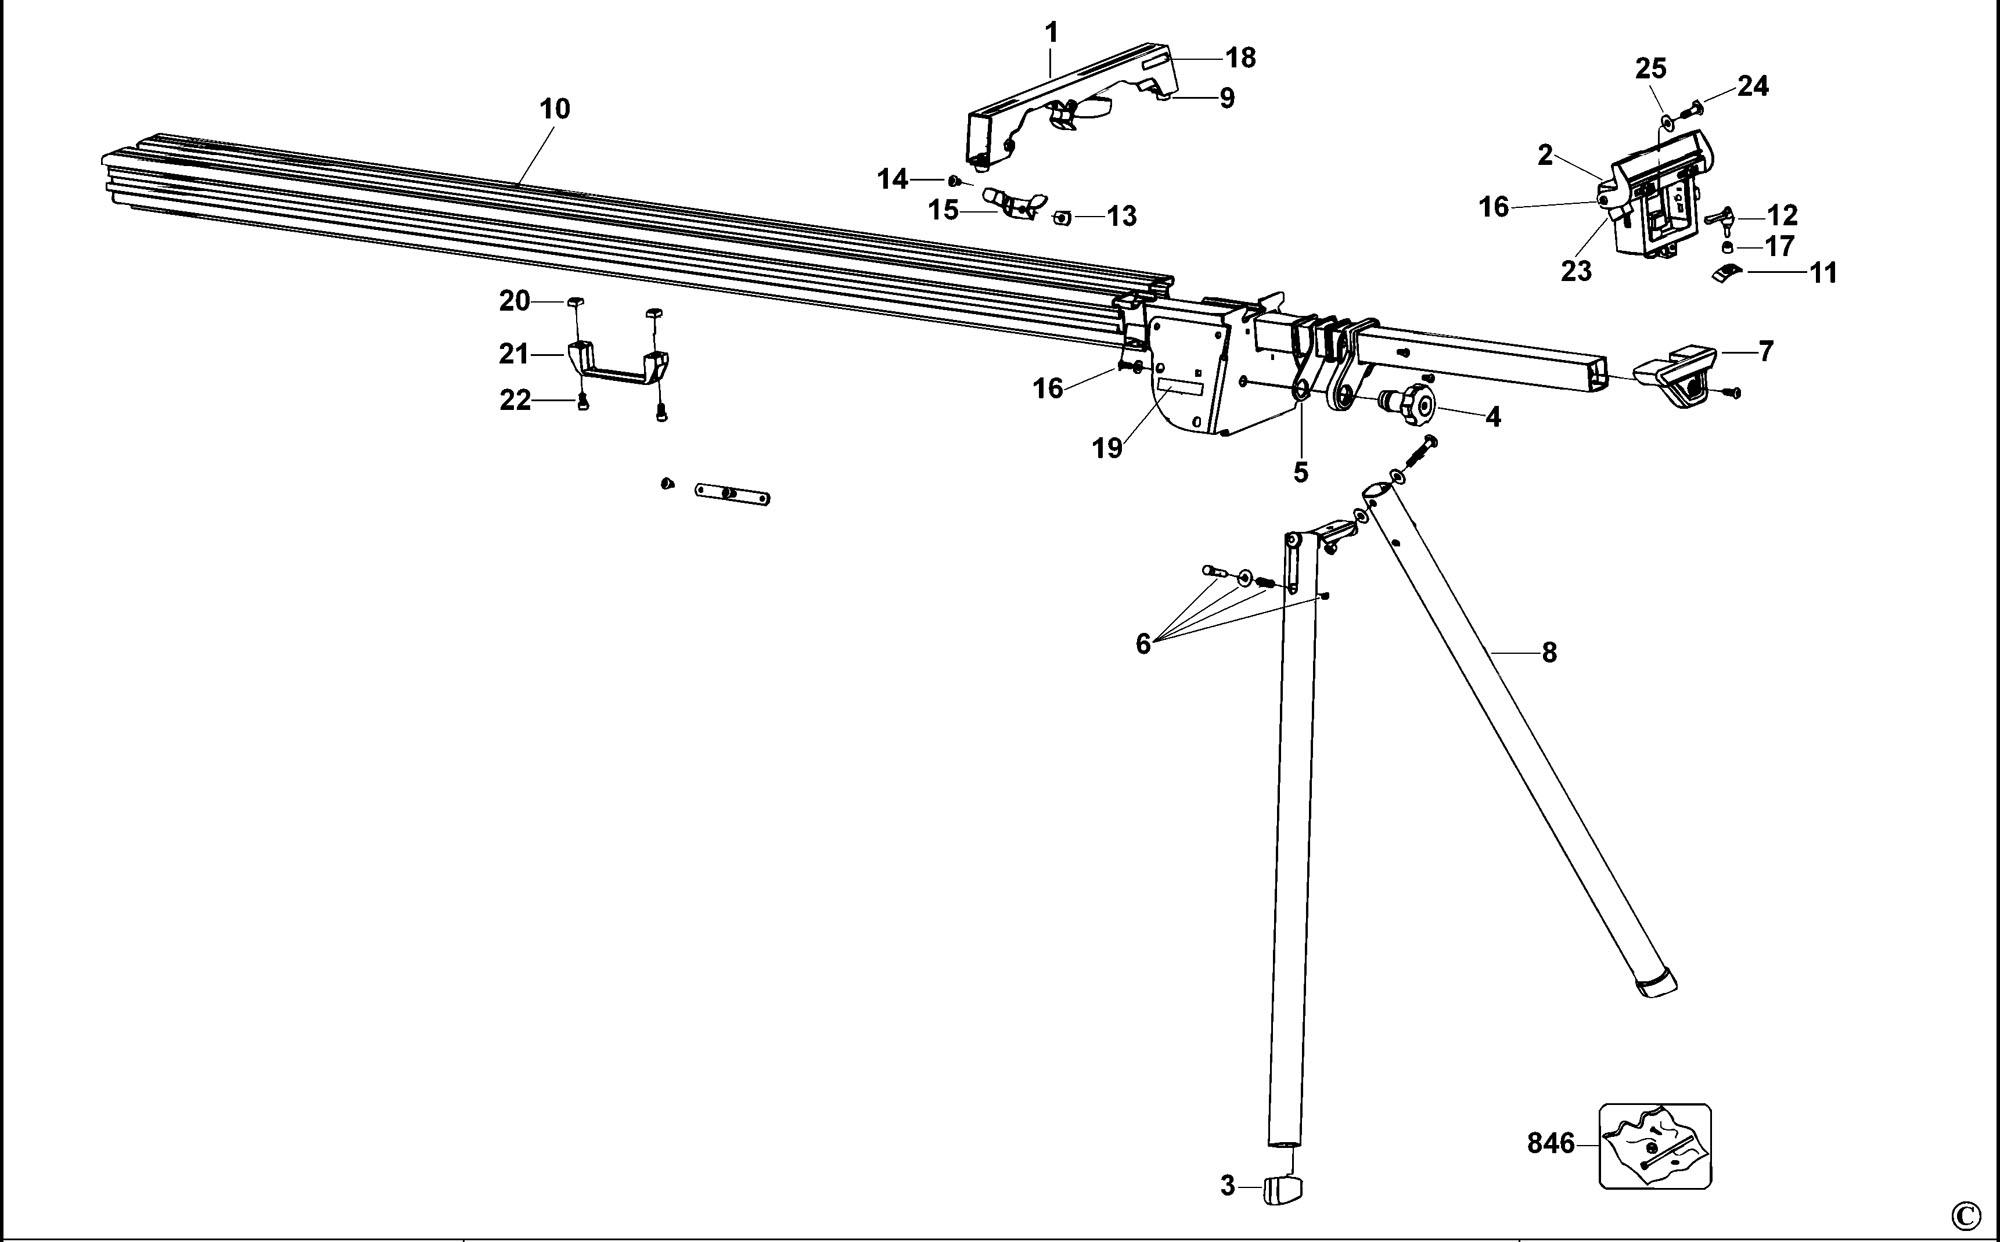 Spares for Dewalt Dw723 Leg Stand (type 1) SPARE_DW723